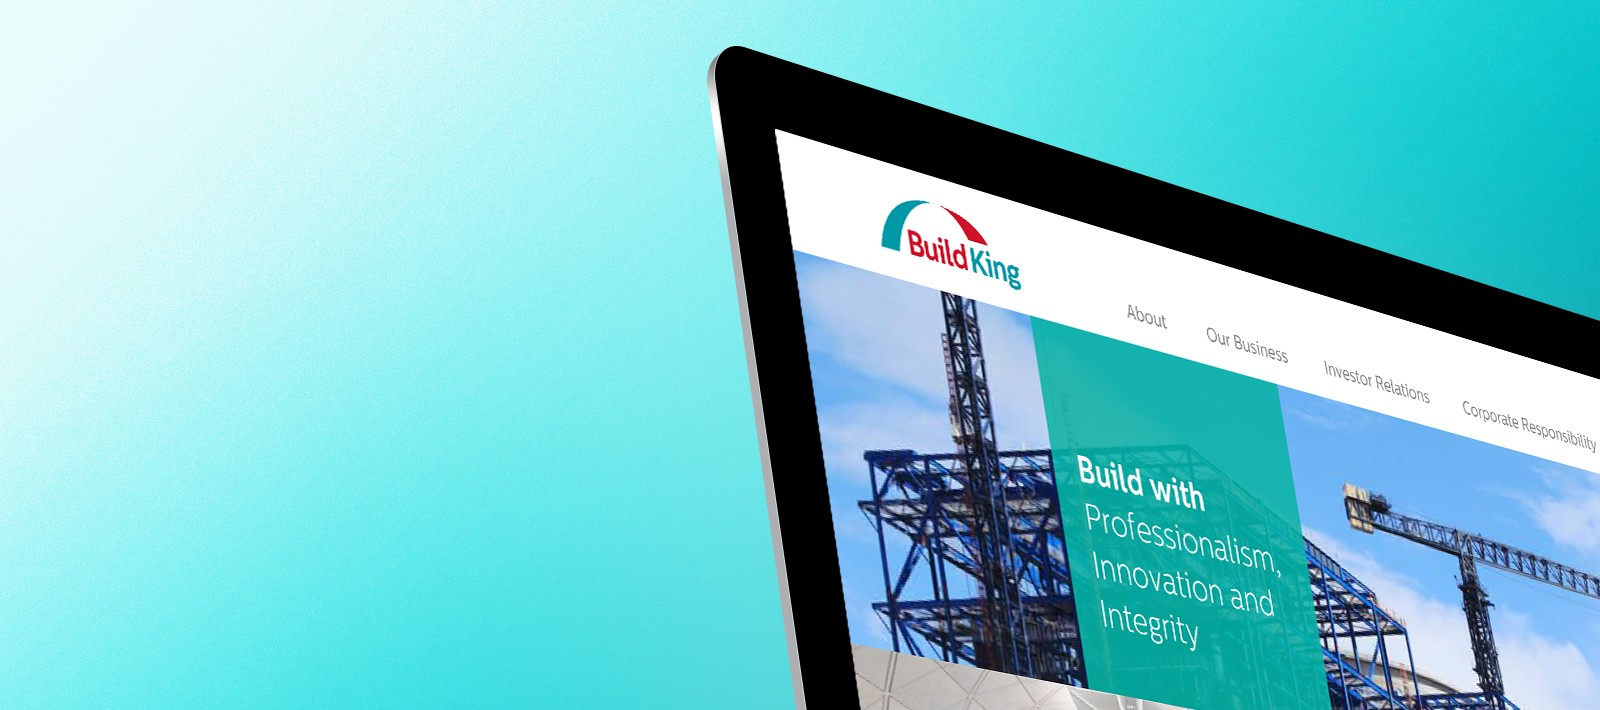 Buildking-professional-brand-refreshment-2